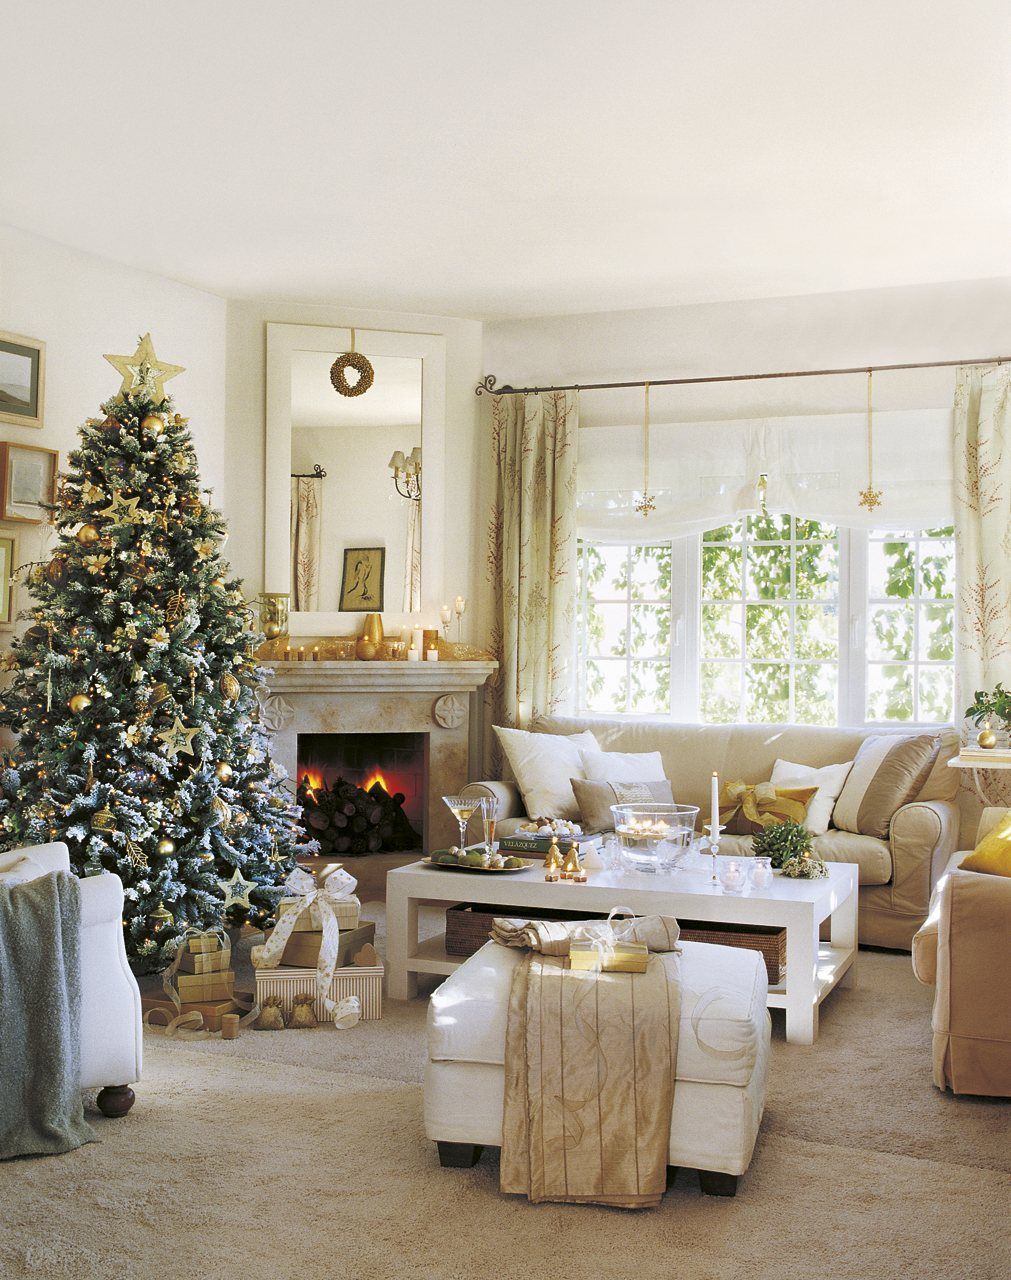 Ventana junto a chimenea ideas decoracion pinterest - La chimenea decoracion ...